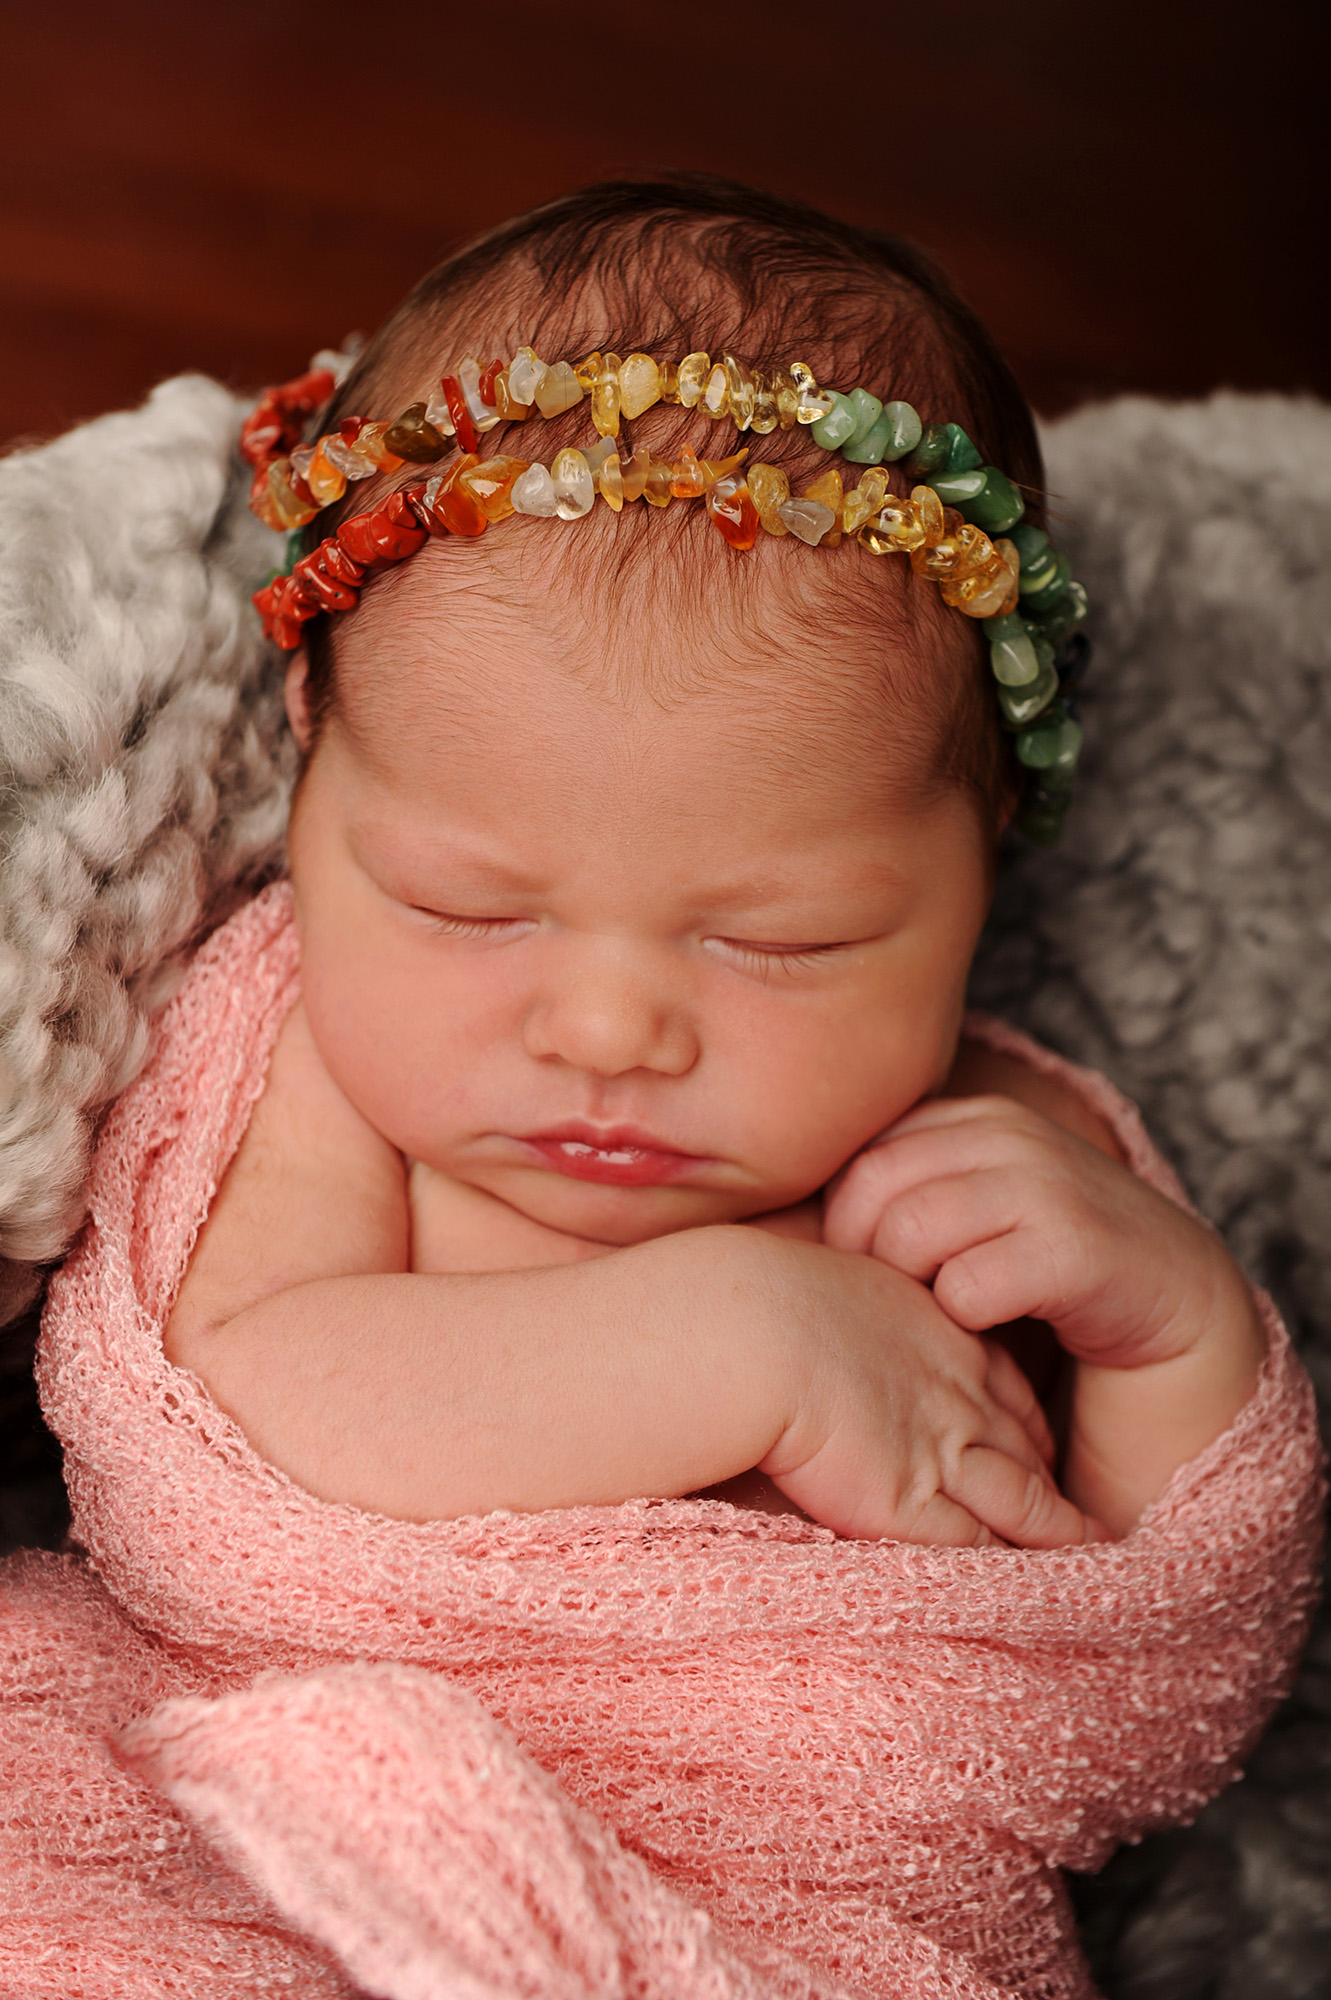 Newborn girl wrapped in pink blanket_ShuteNB_8281.jpg